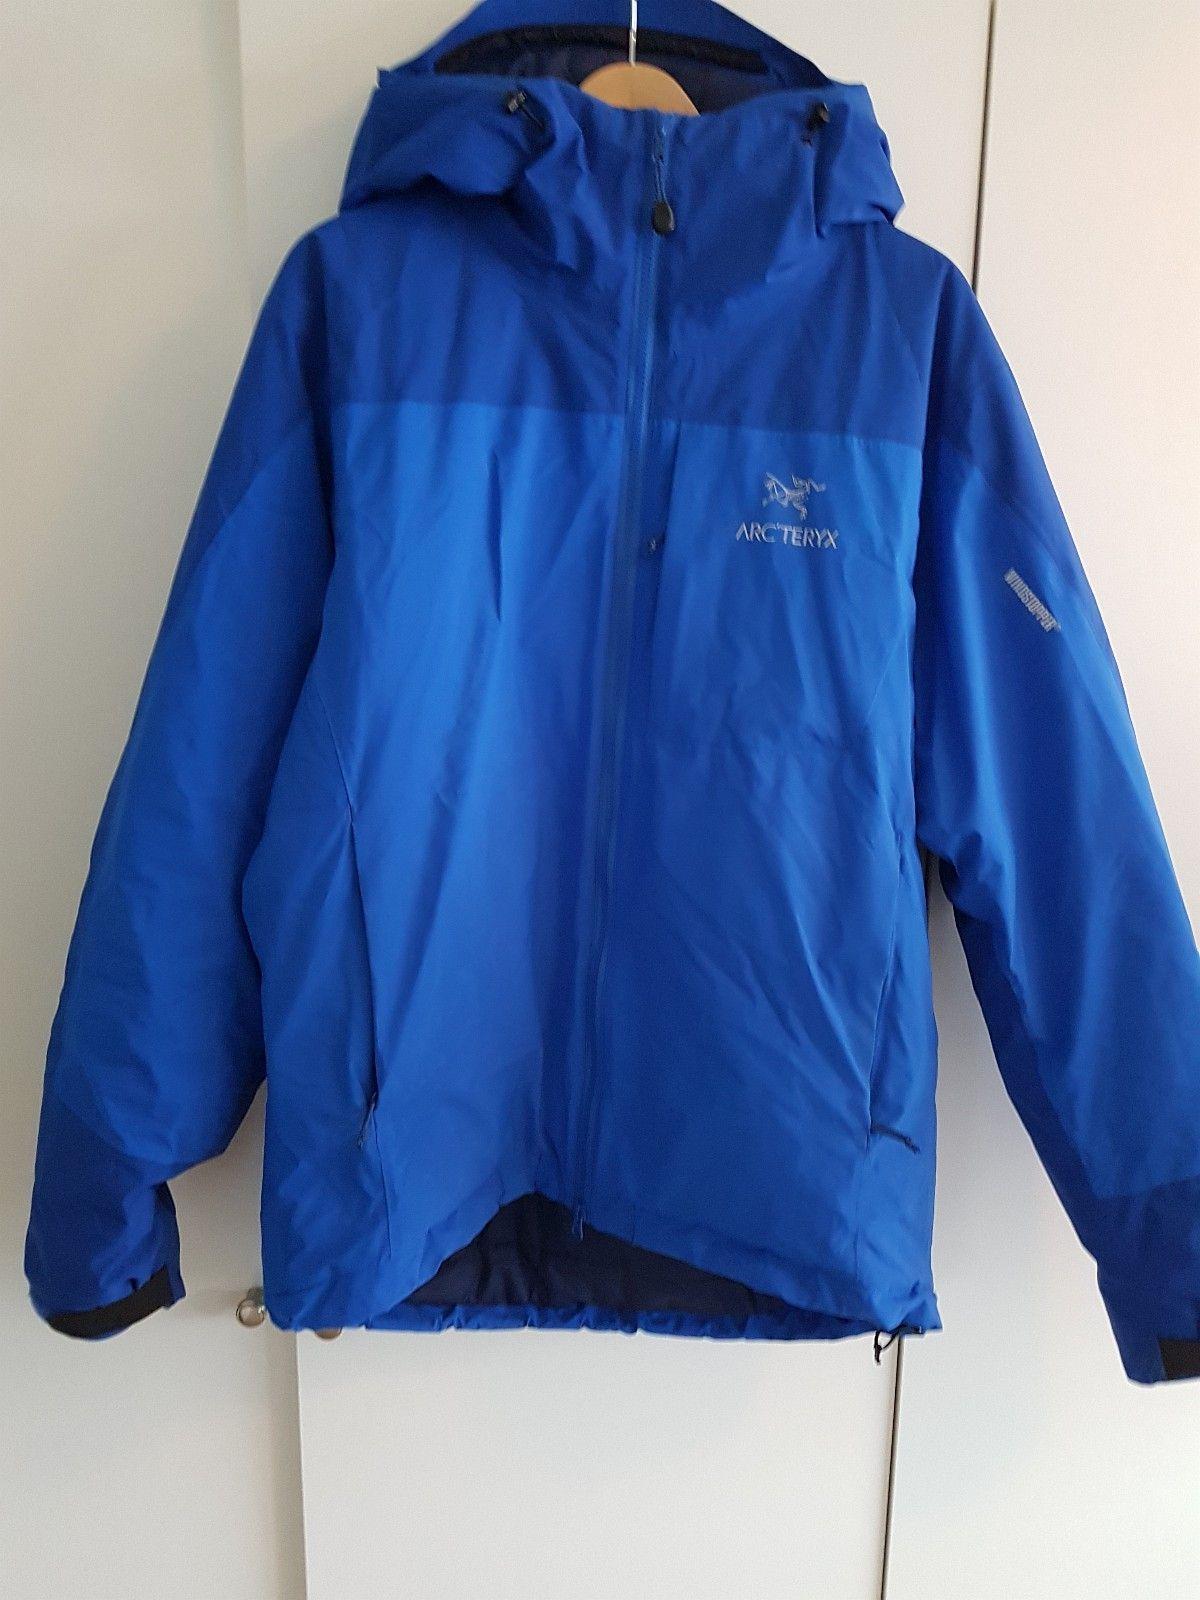 Arc´teryx kappa LT Hoody Jacket - Oslo  - Arc´teryx Kappa LT Hoody Jacket   Størrelse L   Jakken er kjøpt for 2 år siden! Nesten ikke brukt og fremstår som ny!  *This new superlight and highly compressible insulated jacket is a s - Oslo